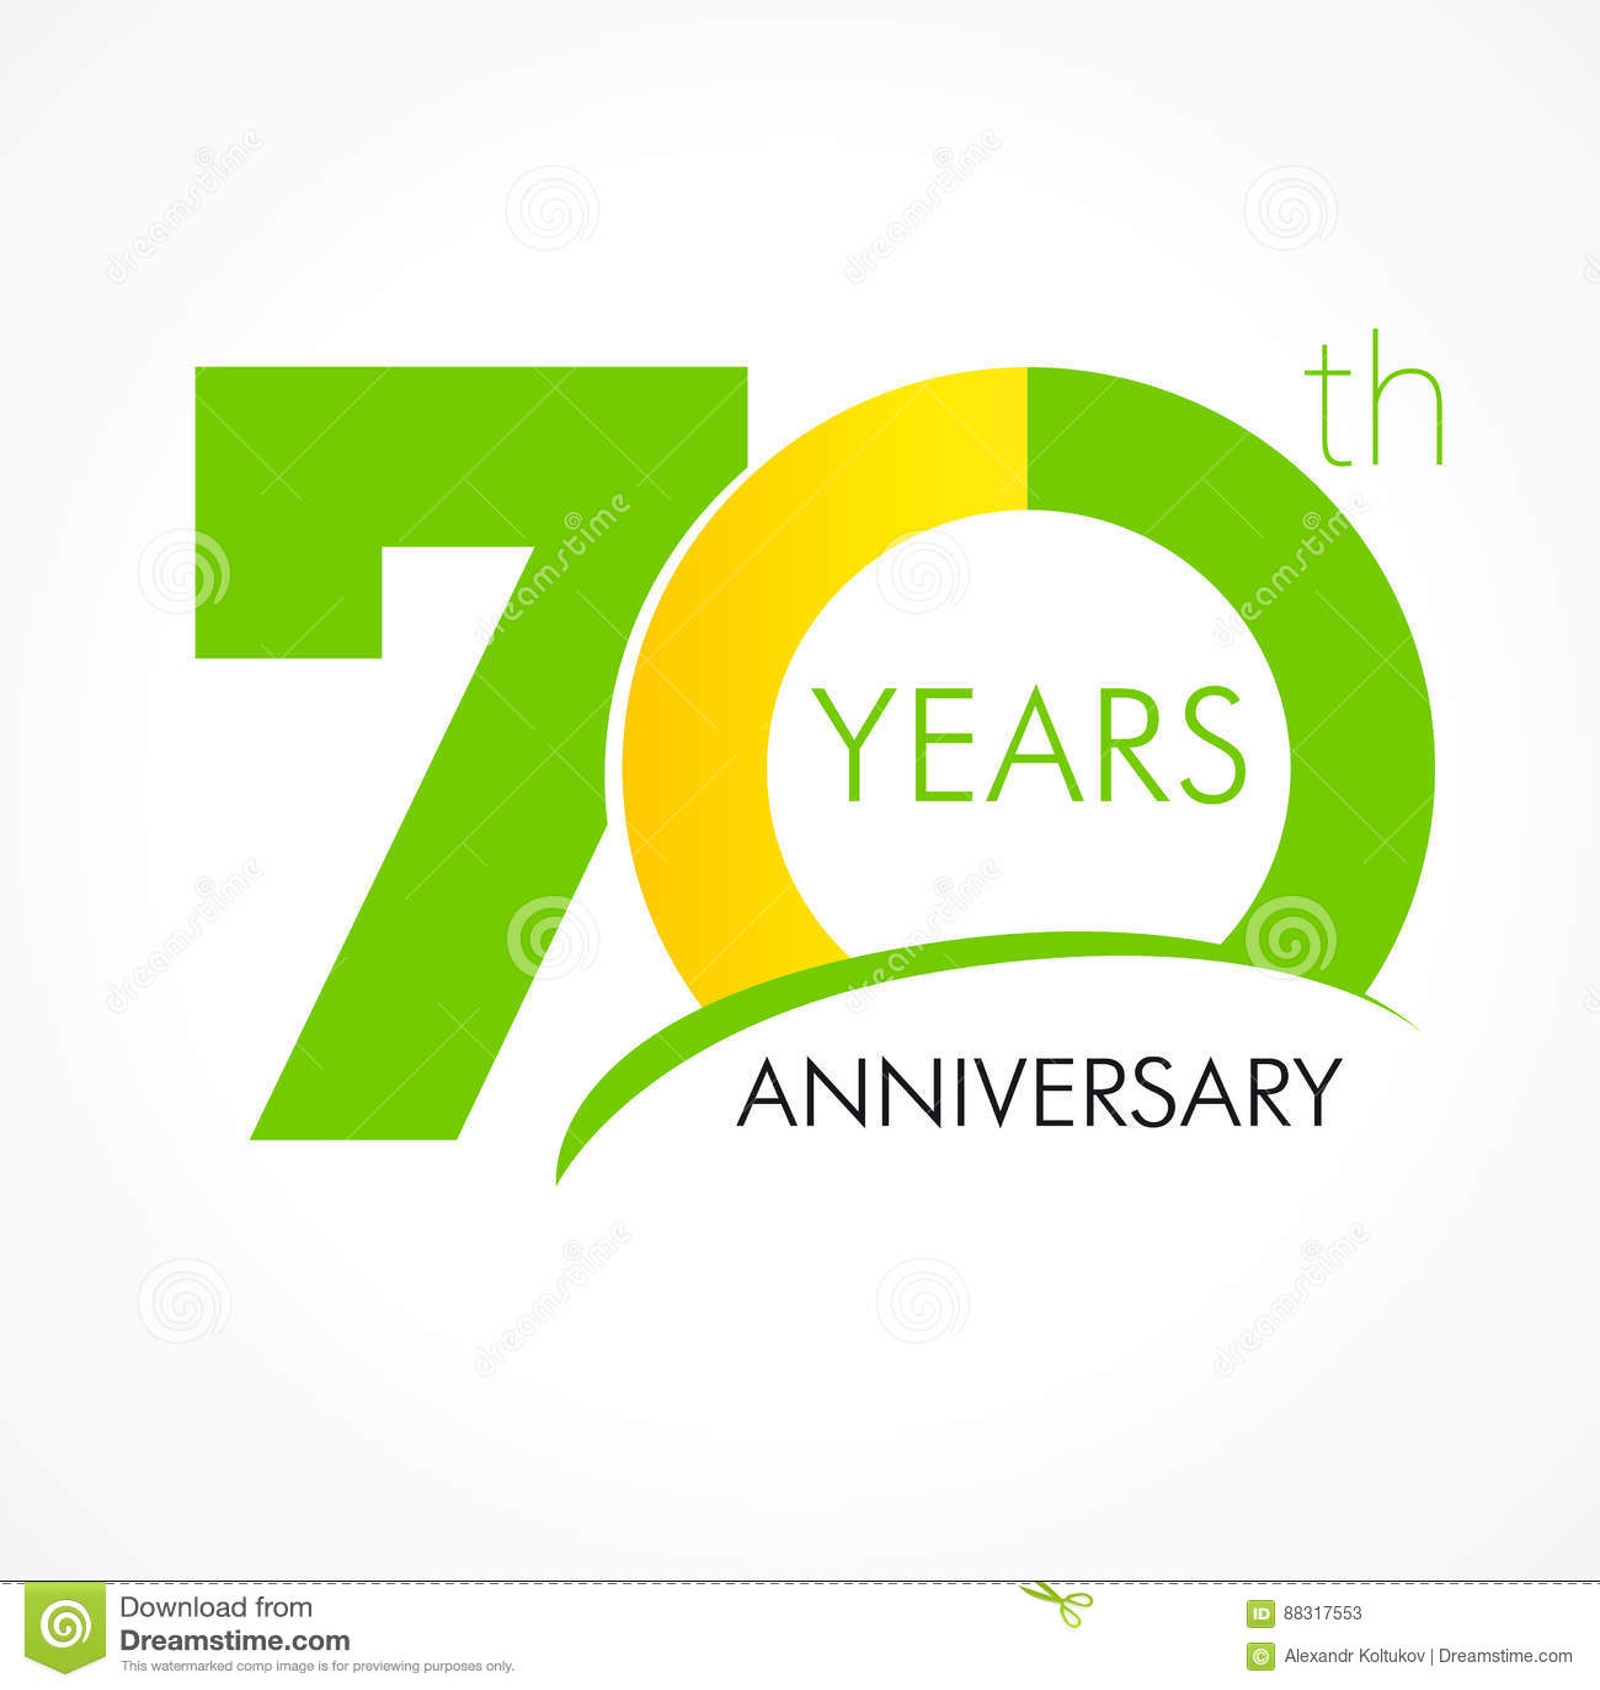 70 Years Old Celebrating Classic Logo